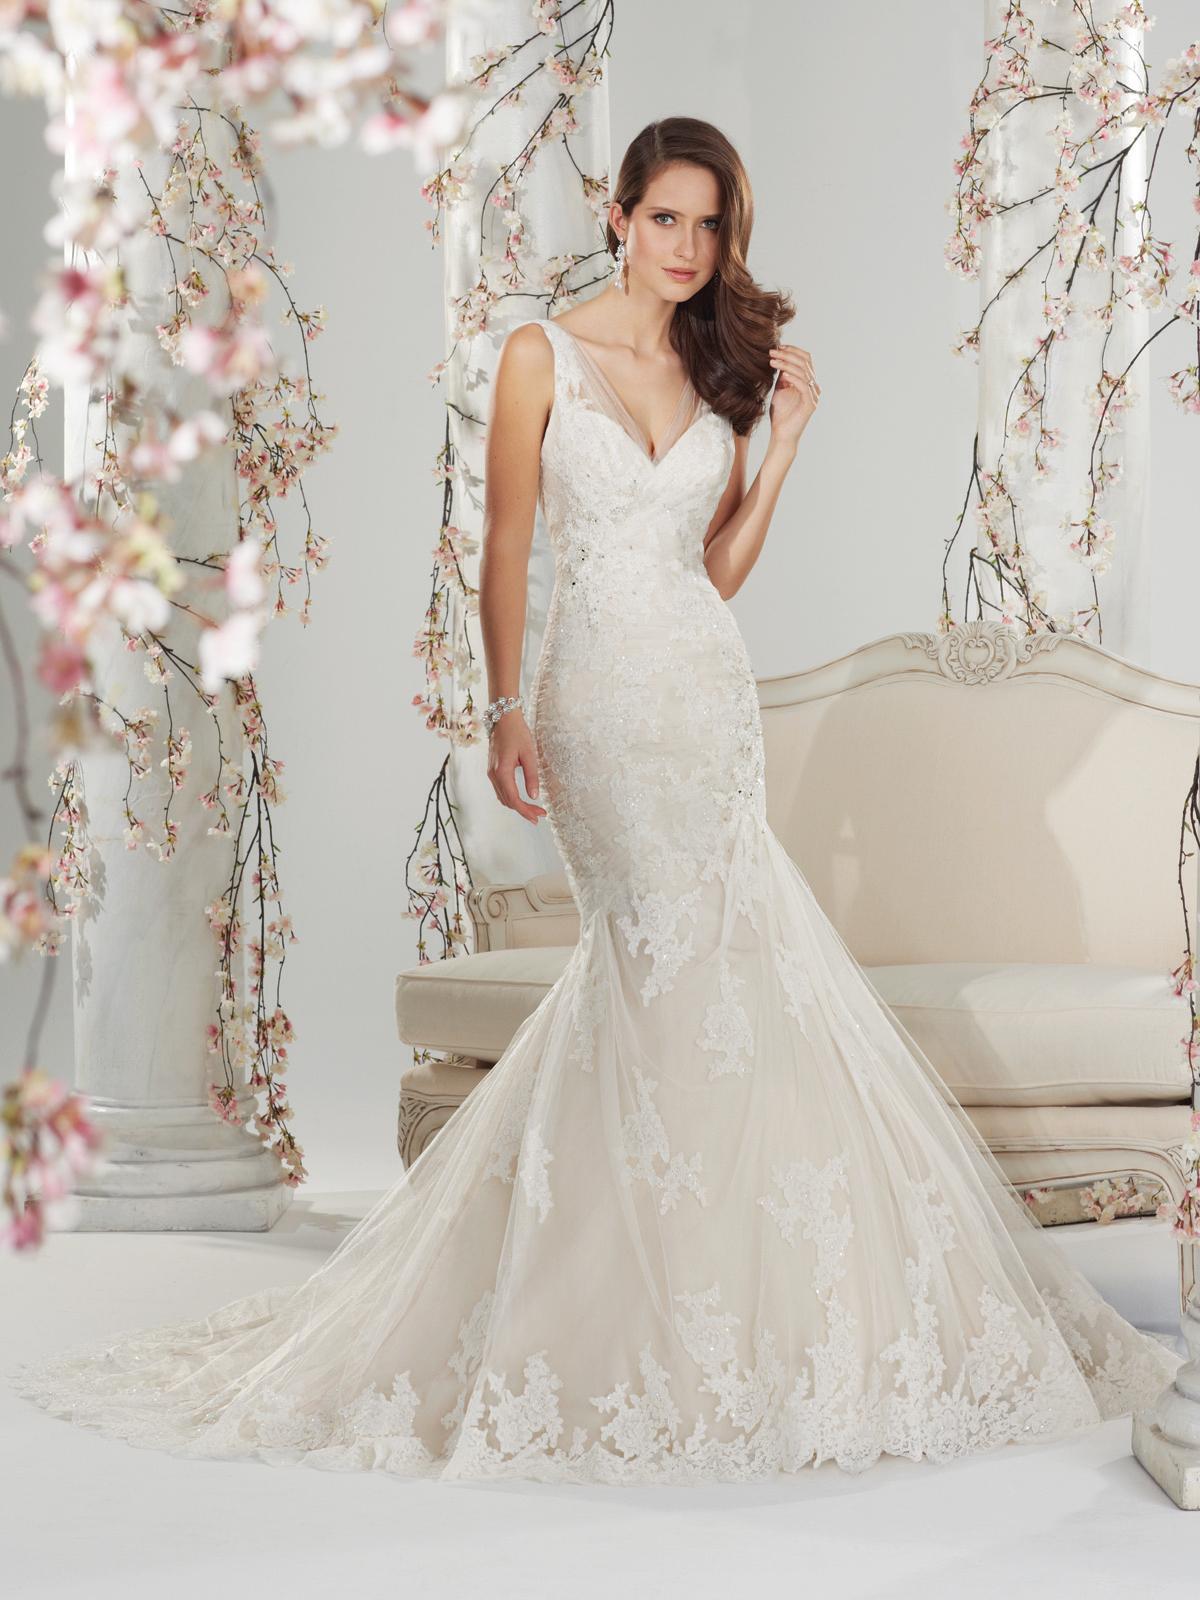 Wedding Dresses Albuquerque - Wedding Photography